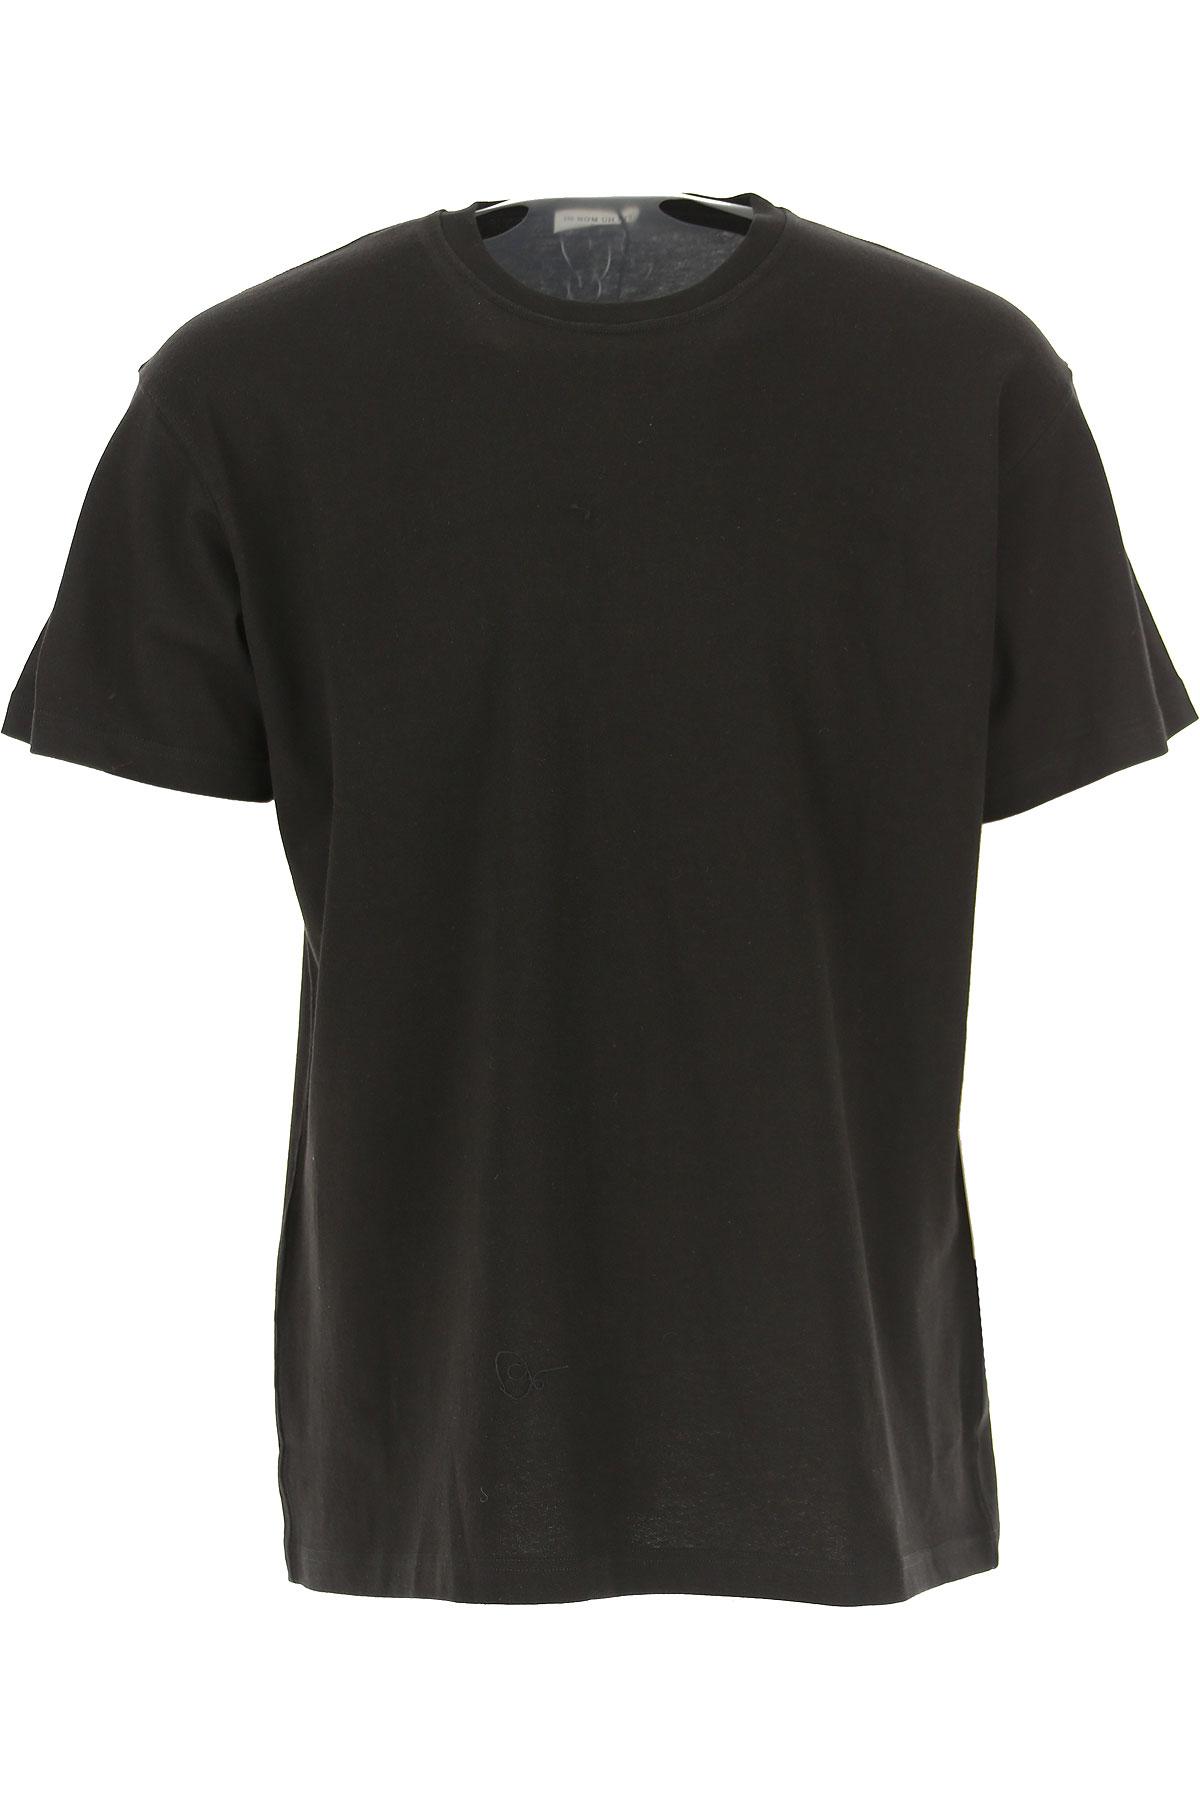 Ih Nom Uh Nit T-Shirt for Men On Sale, Black, Cotton, 2019, L M S XL